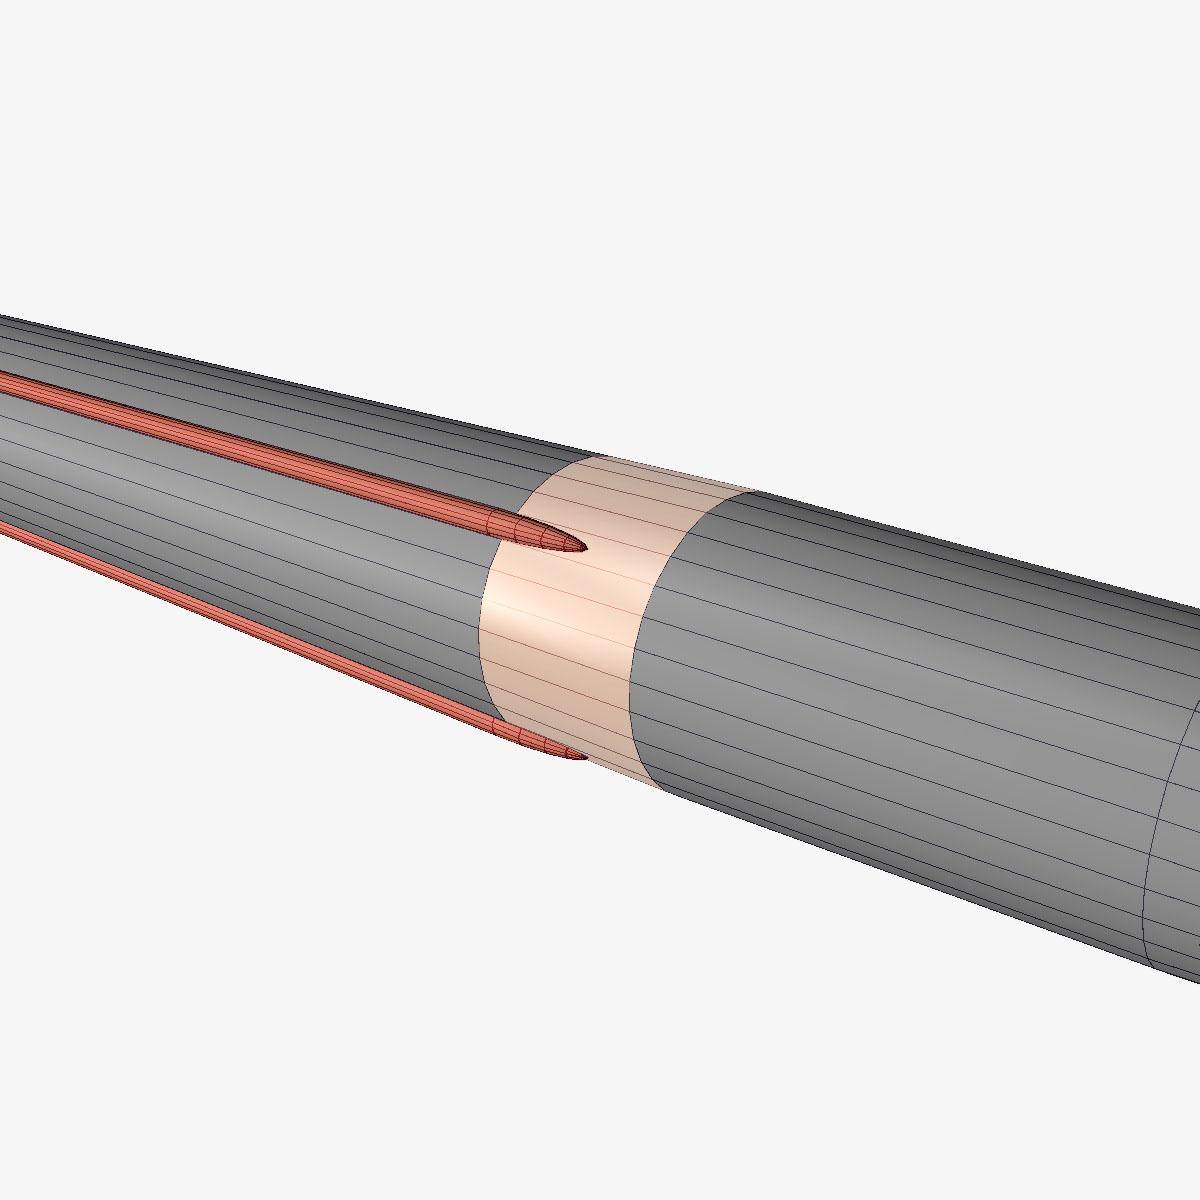 aerobee 170 rocket 3d model 3ds dxf fbx blend cob dae x  obj 166044